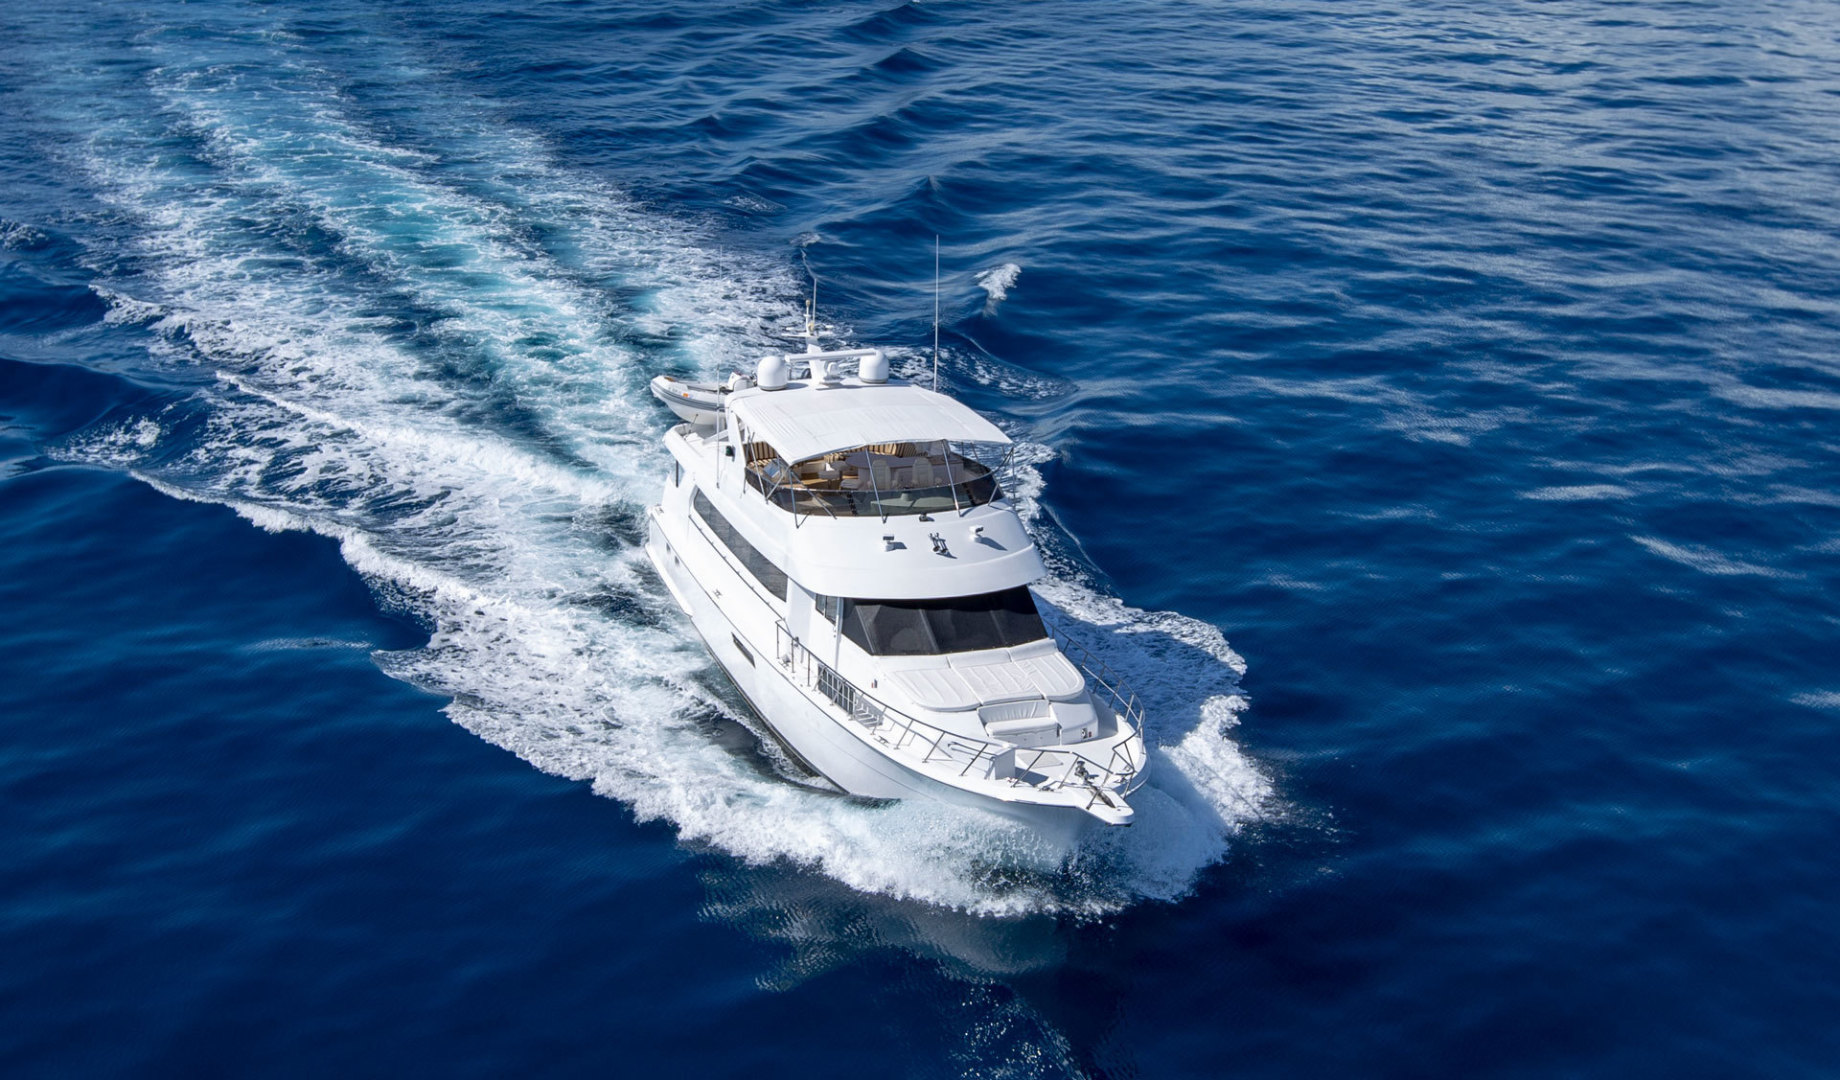 Hatteras-Cockpit Motor Yacht 2000-Getaway Ft. Lauderdale-Florida-United States-1417502 | Thumbnail